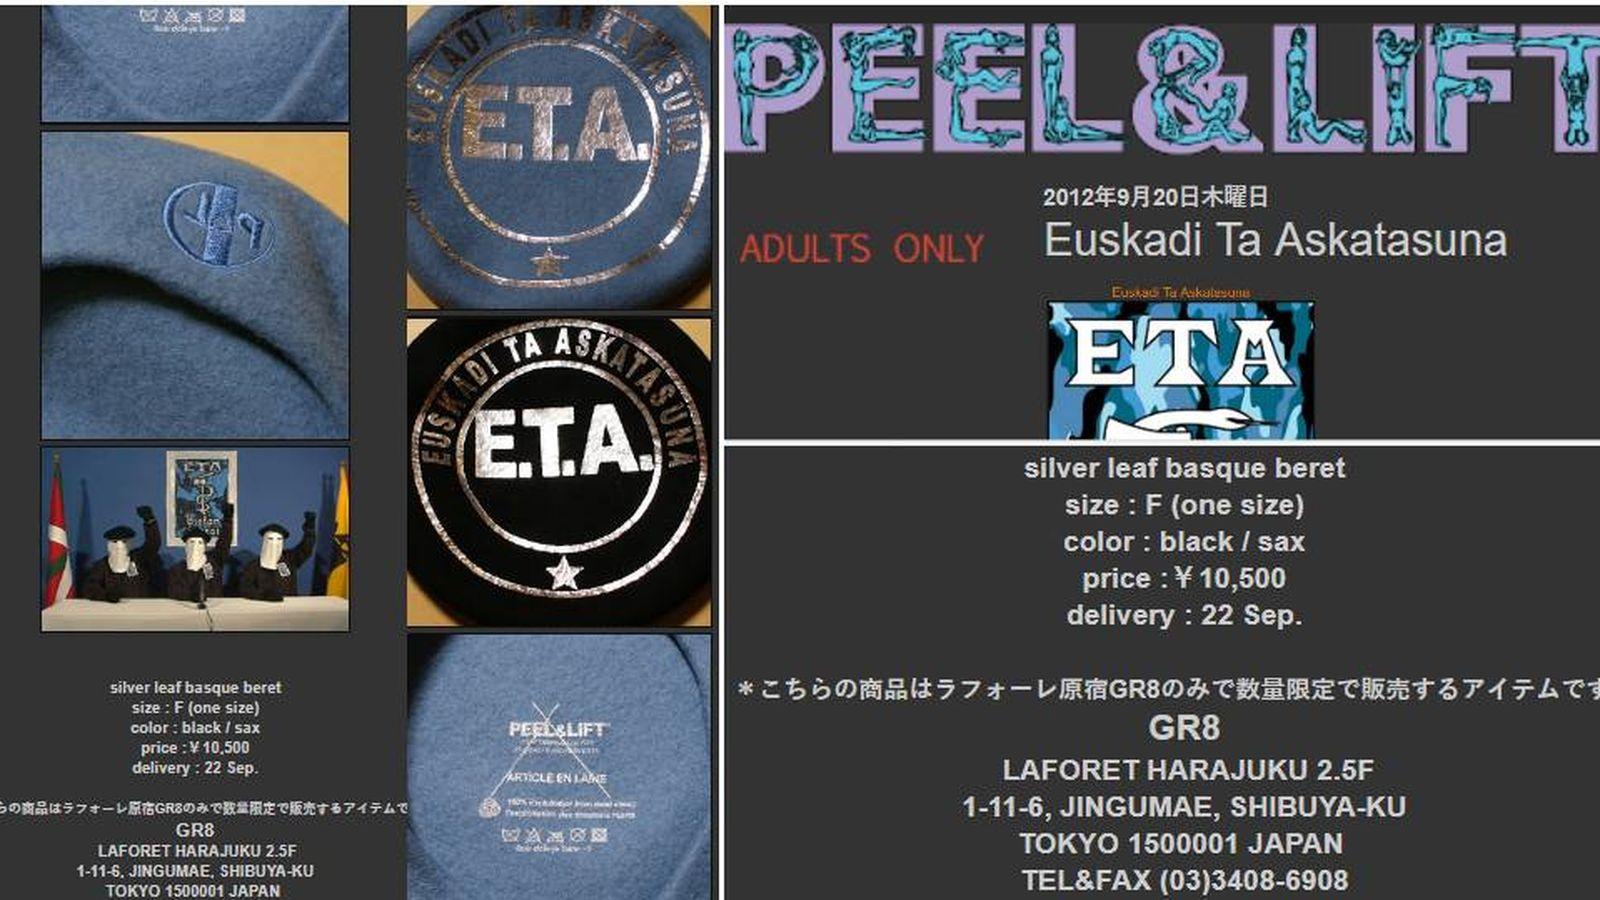 ETA (banda terrorista)  Chapelas a 80 euros  la web japonesa que vende  merchandising de ETA desde 2012 90f99423813